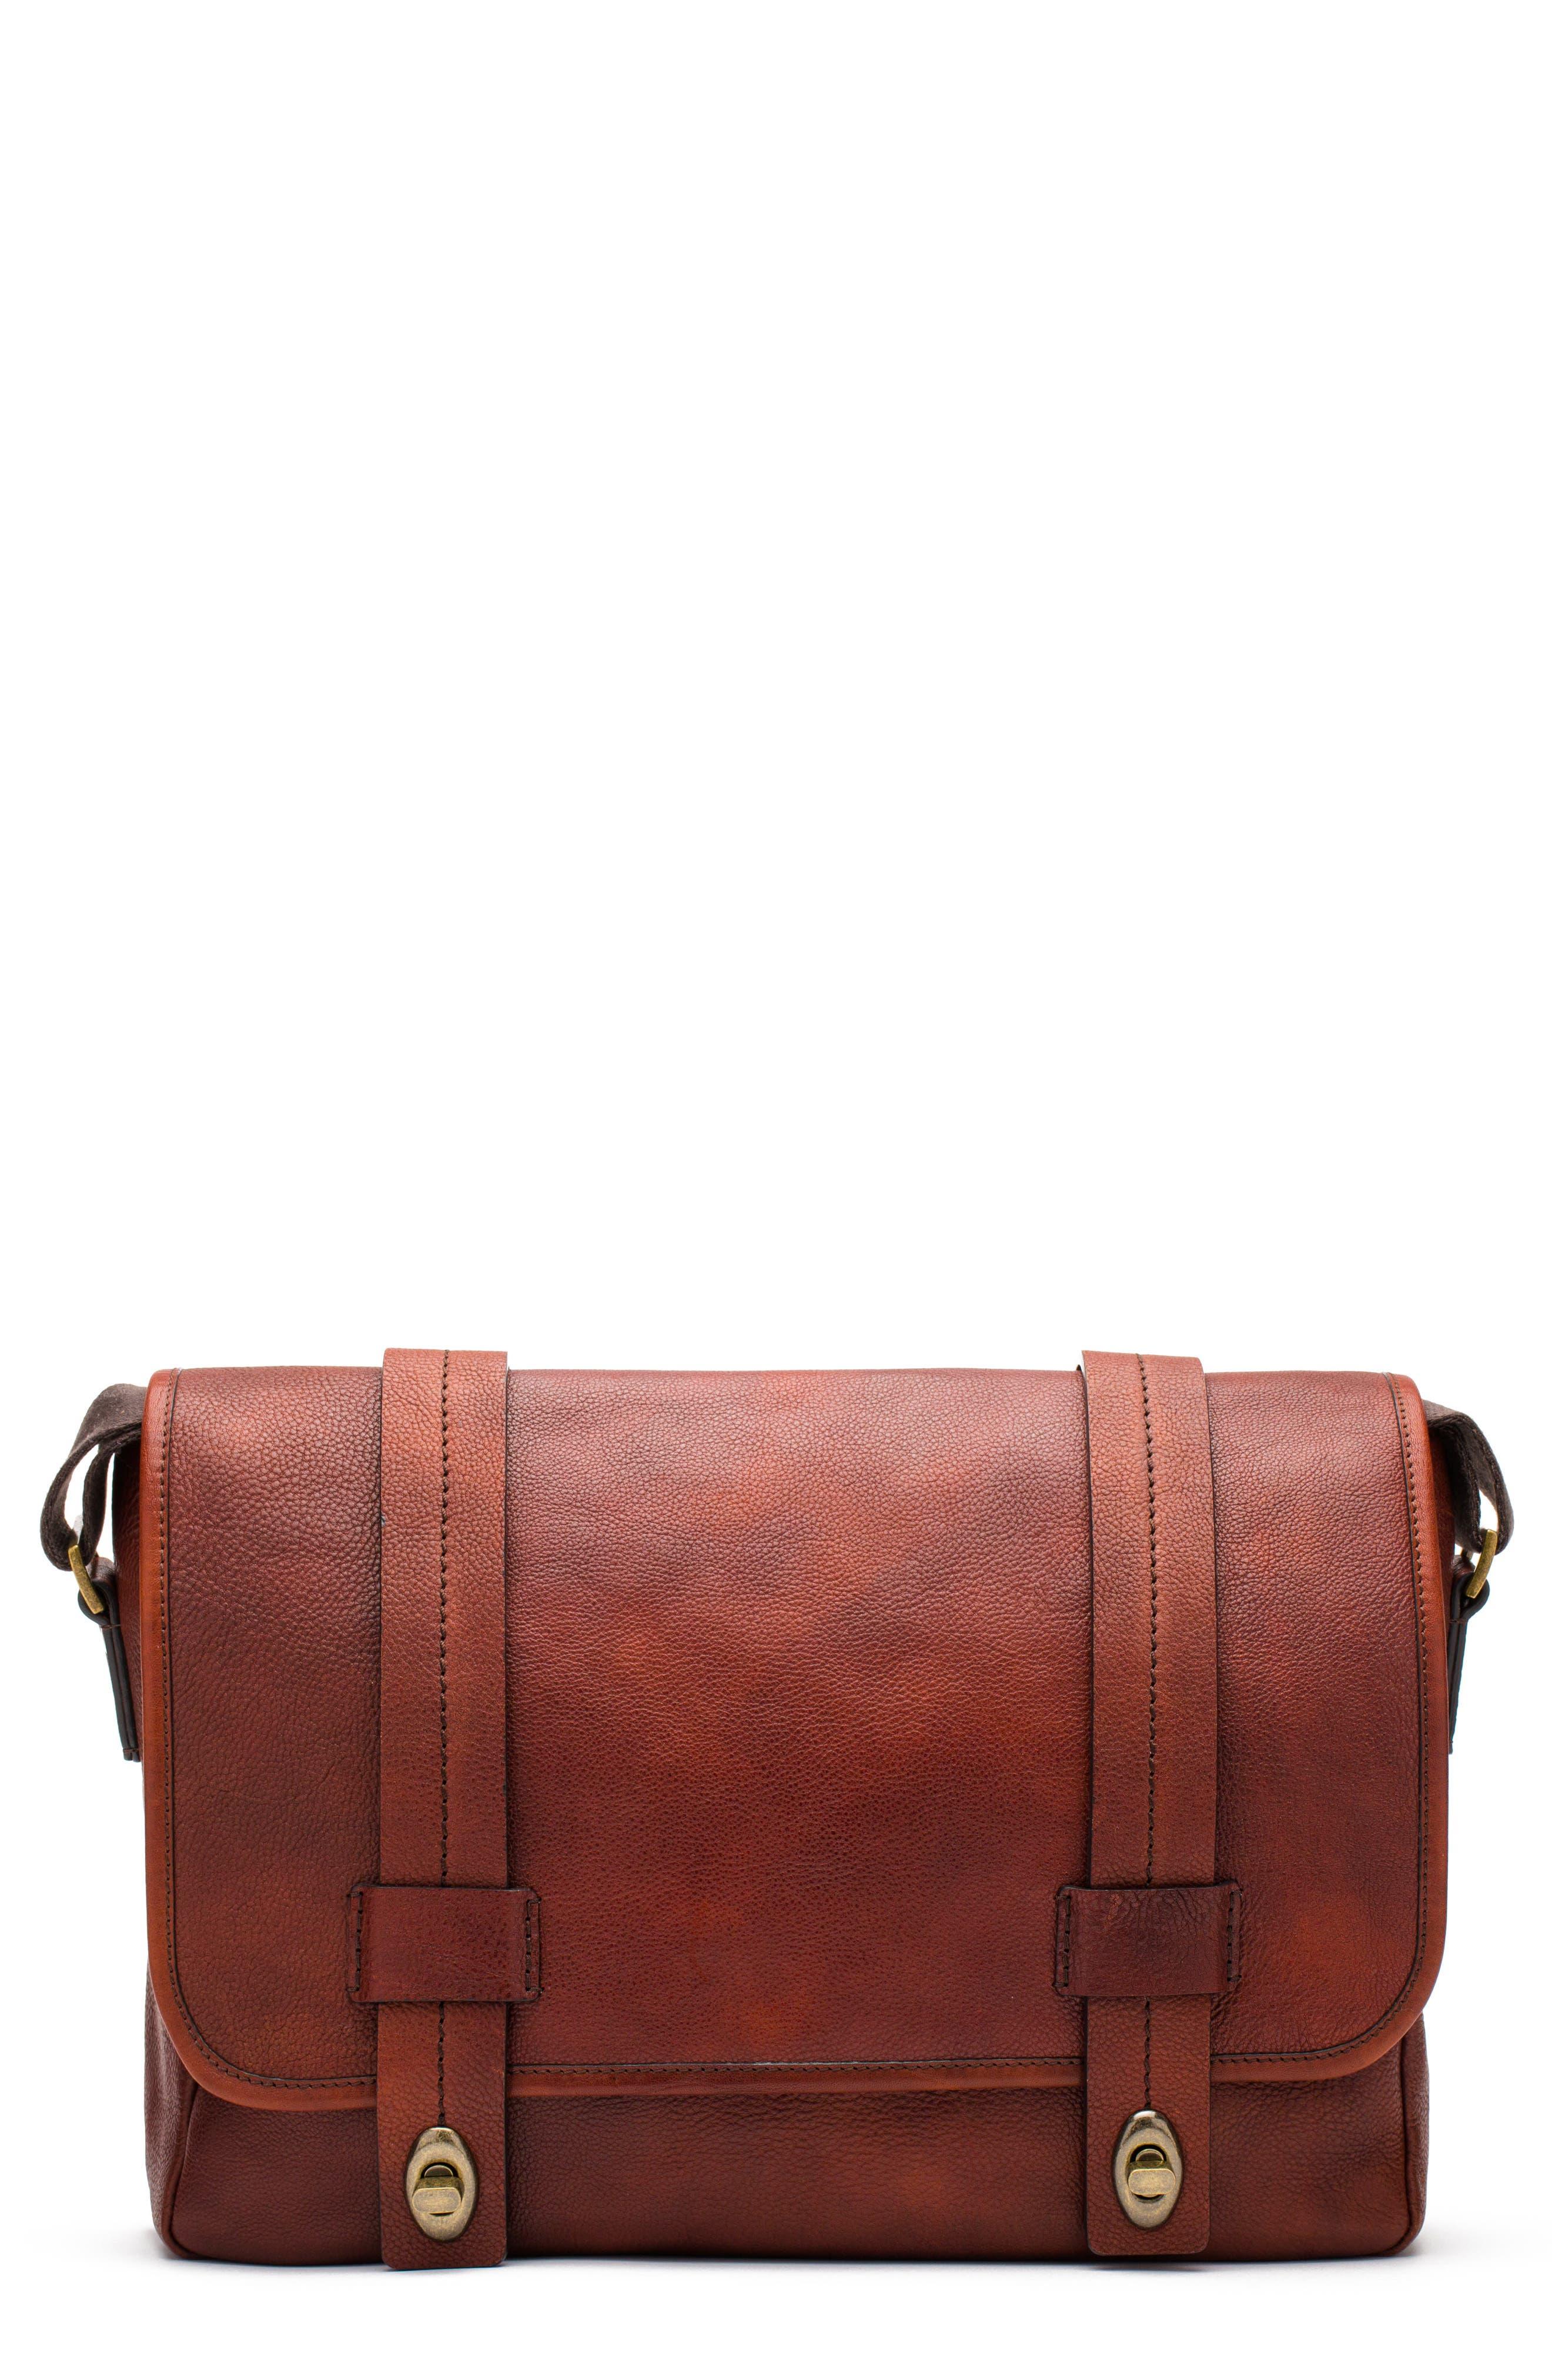 Leather Messenger Bag,                             Main thumbnail 1, color,                             DARK BROWN